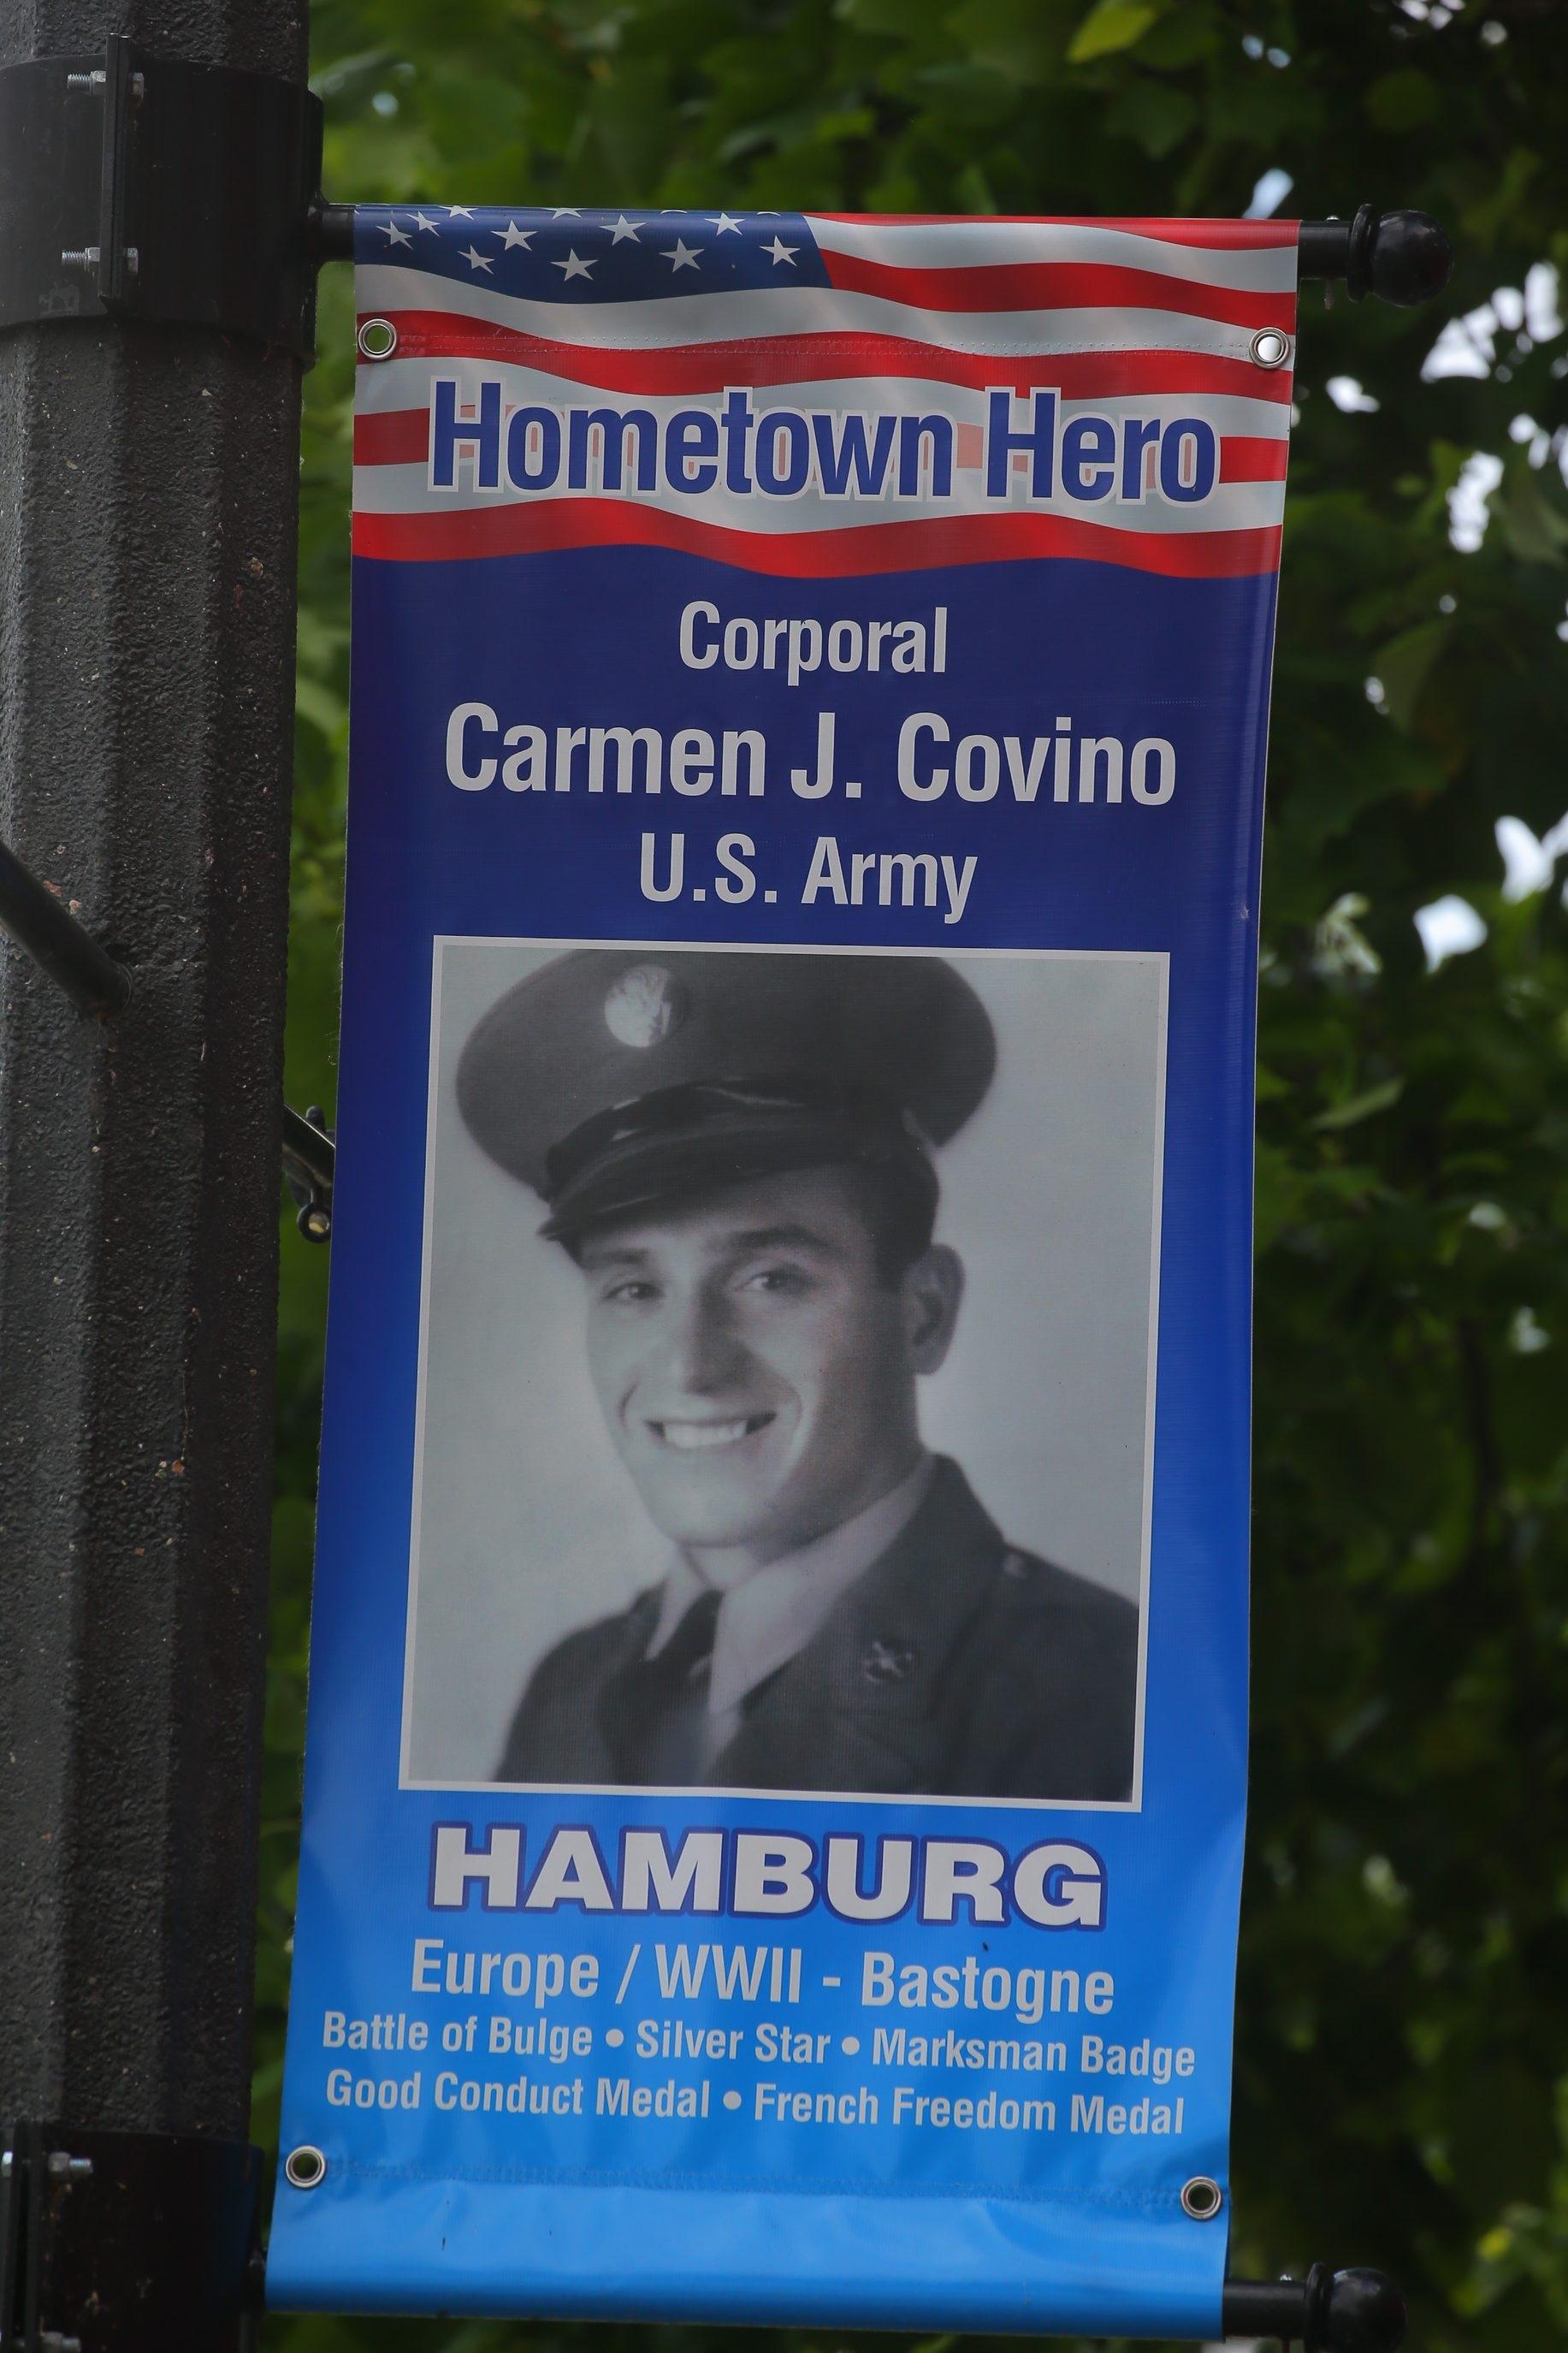 One of the Hometown Hero banners on Buffalo Street. (John Hickey/Buffalo News file photo)